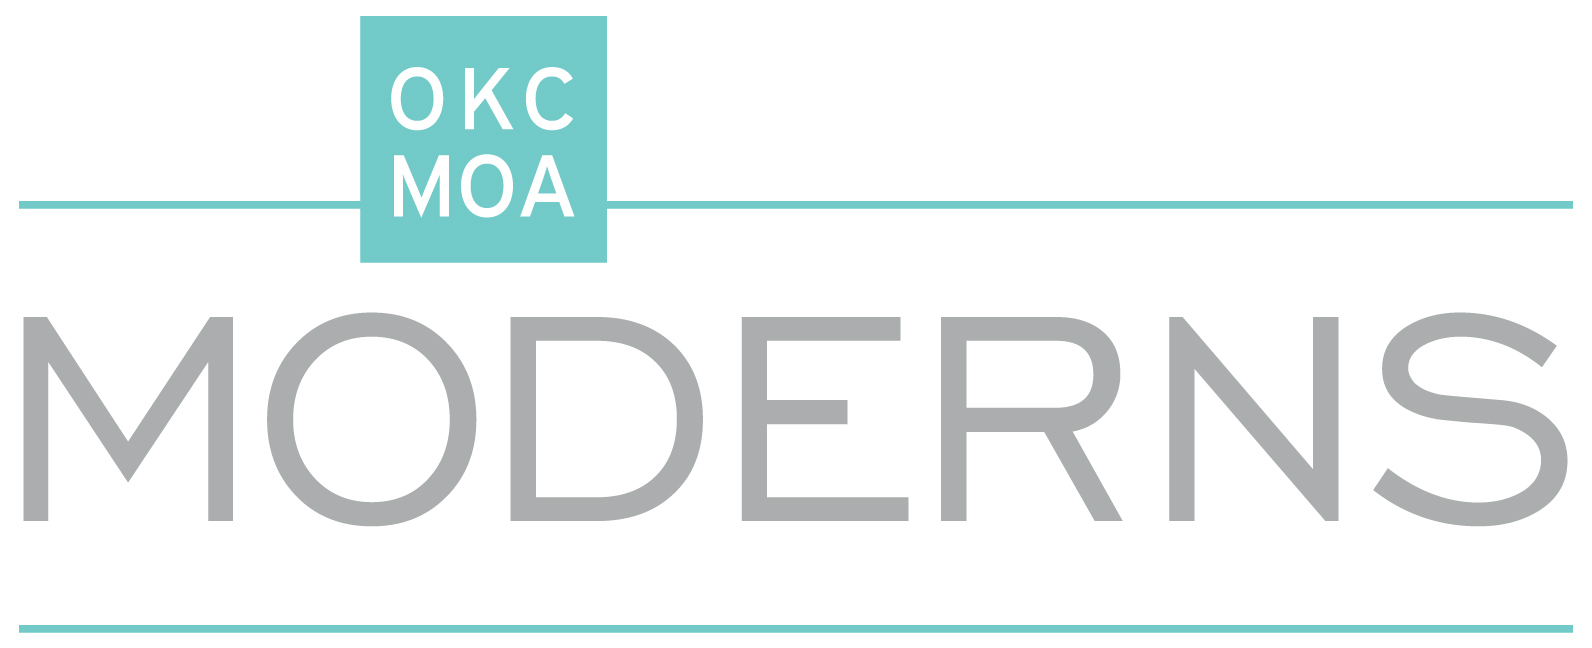 July 2019-June 2021 Moderns Board Member Application Survey